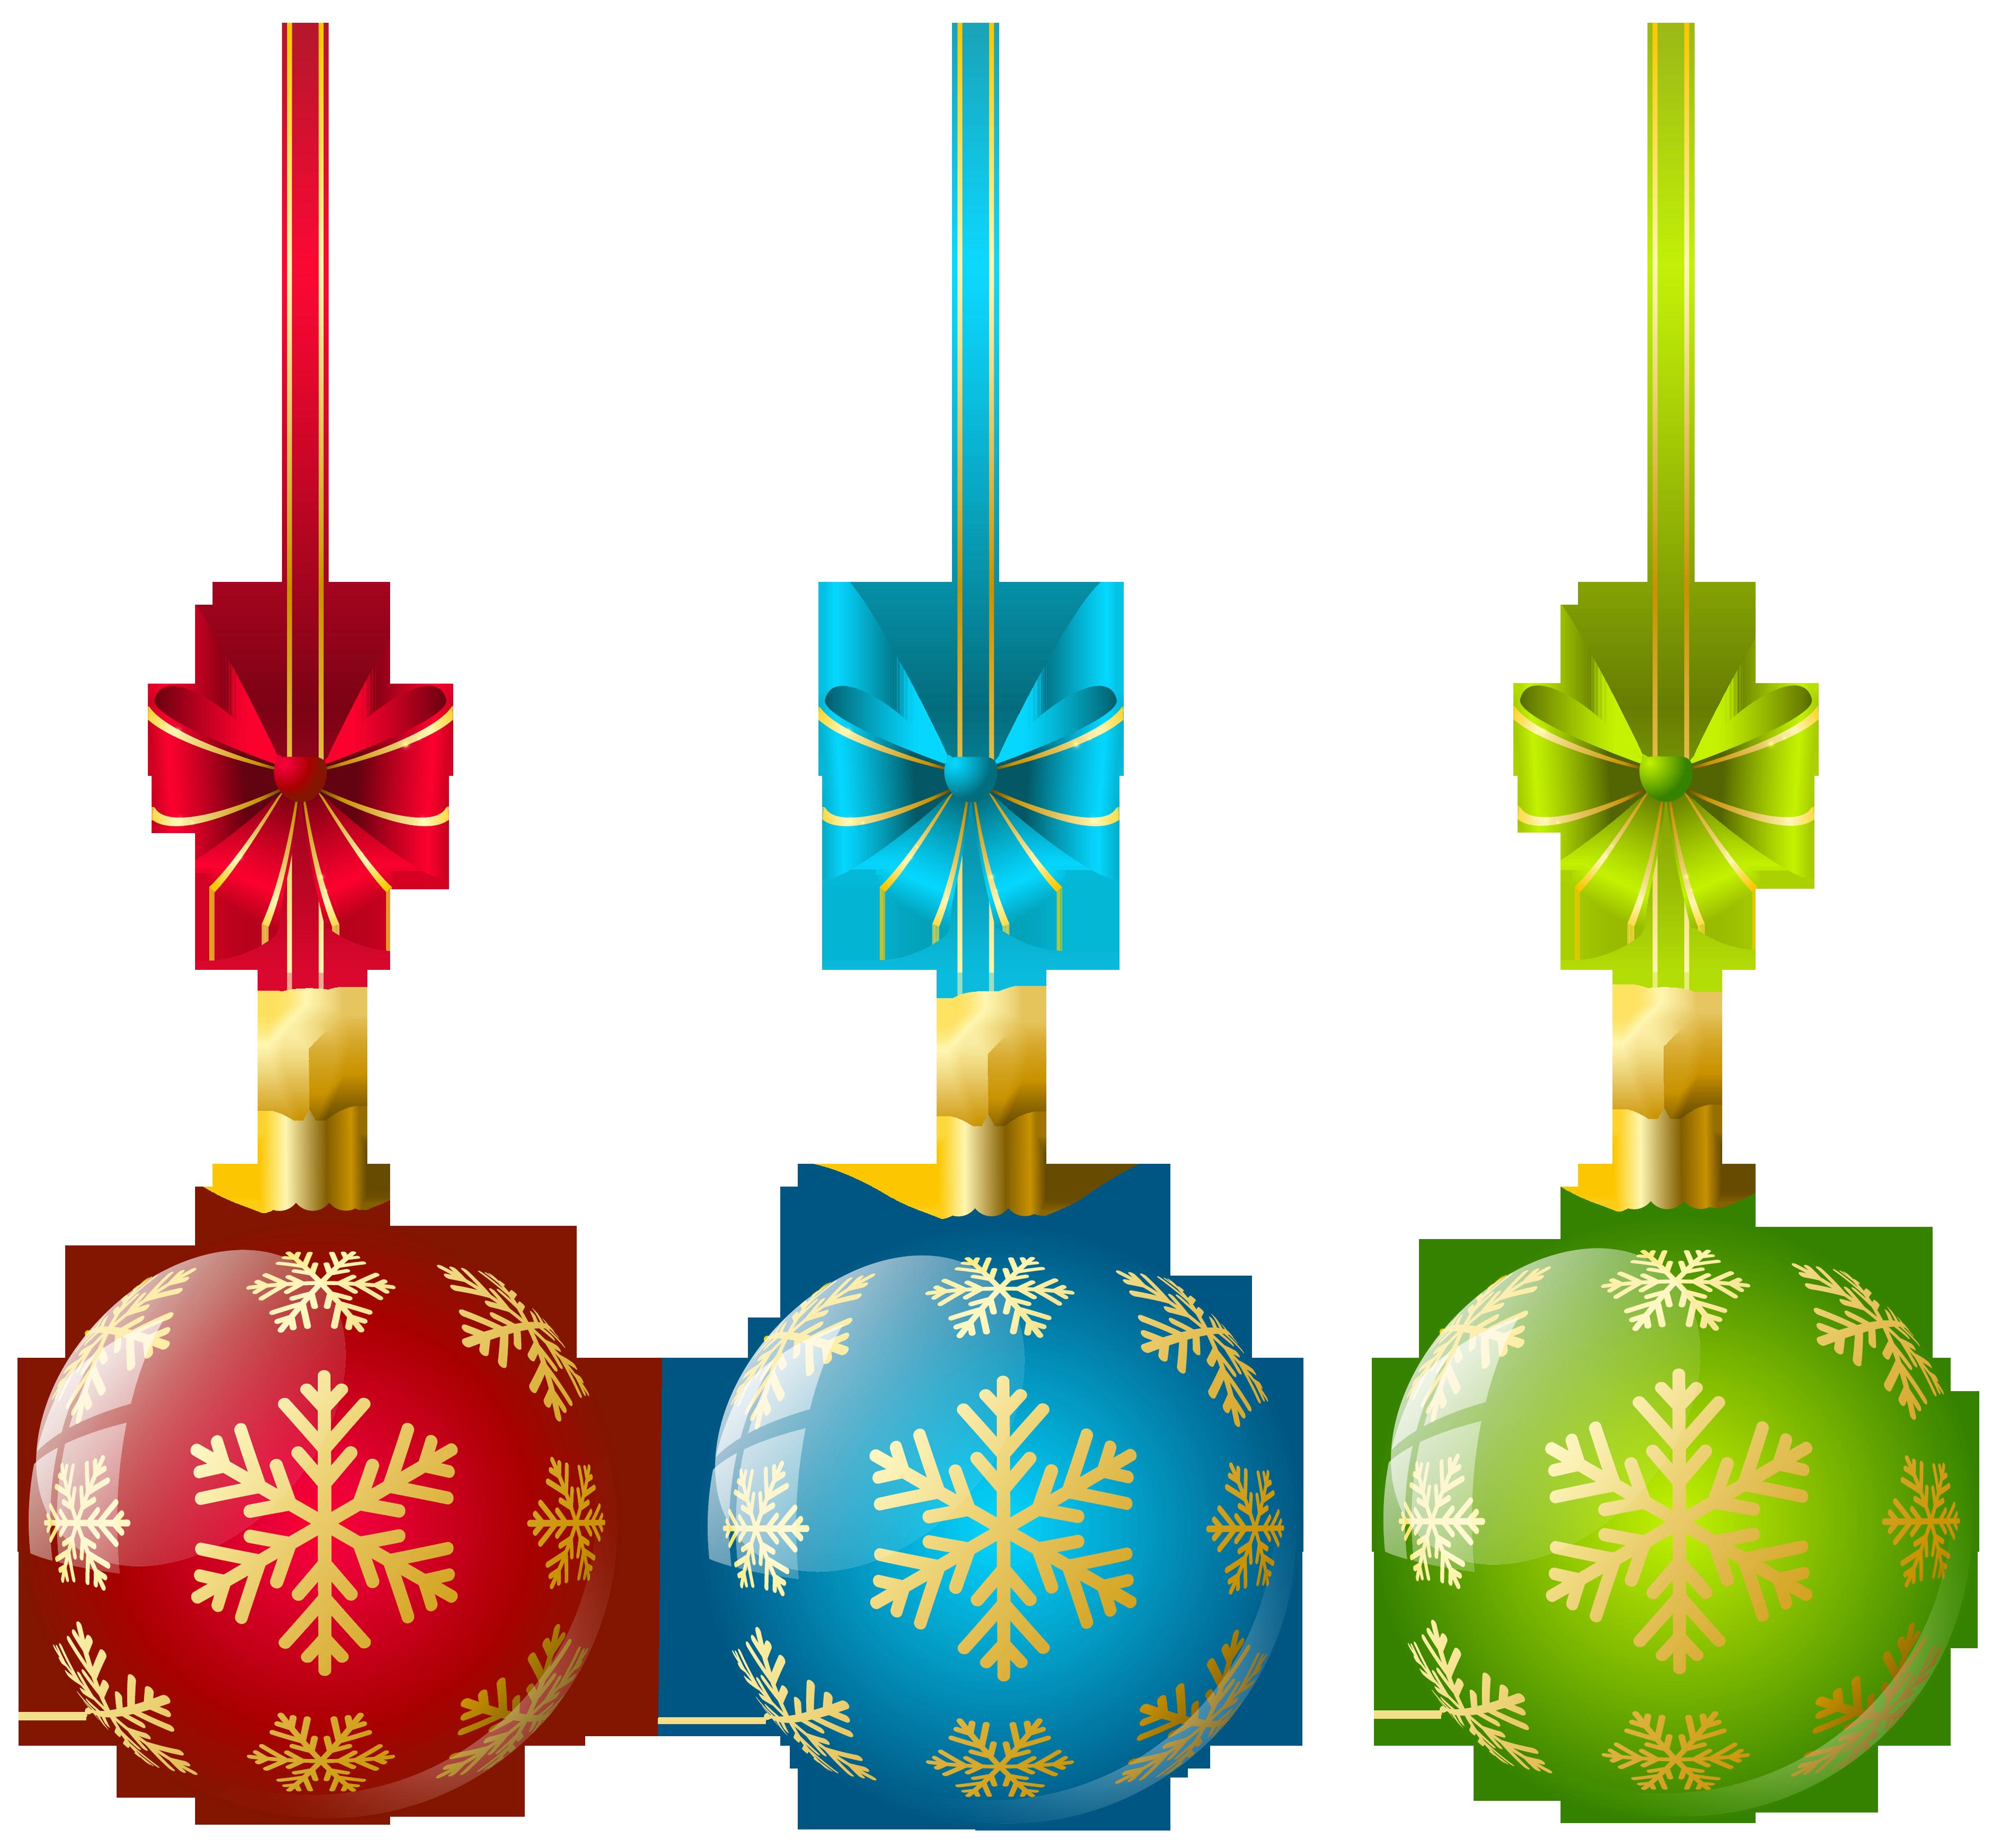 Christmas Ornament Clip Art Cliparts Co-Christmas Ornament Clip Art Cliparts Co-4